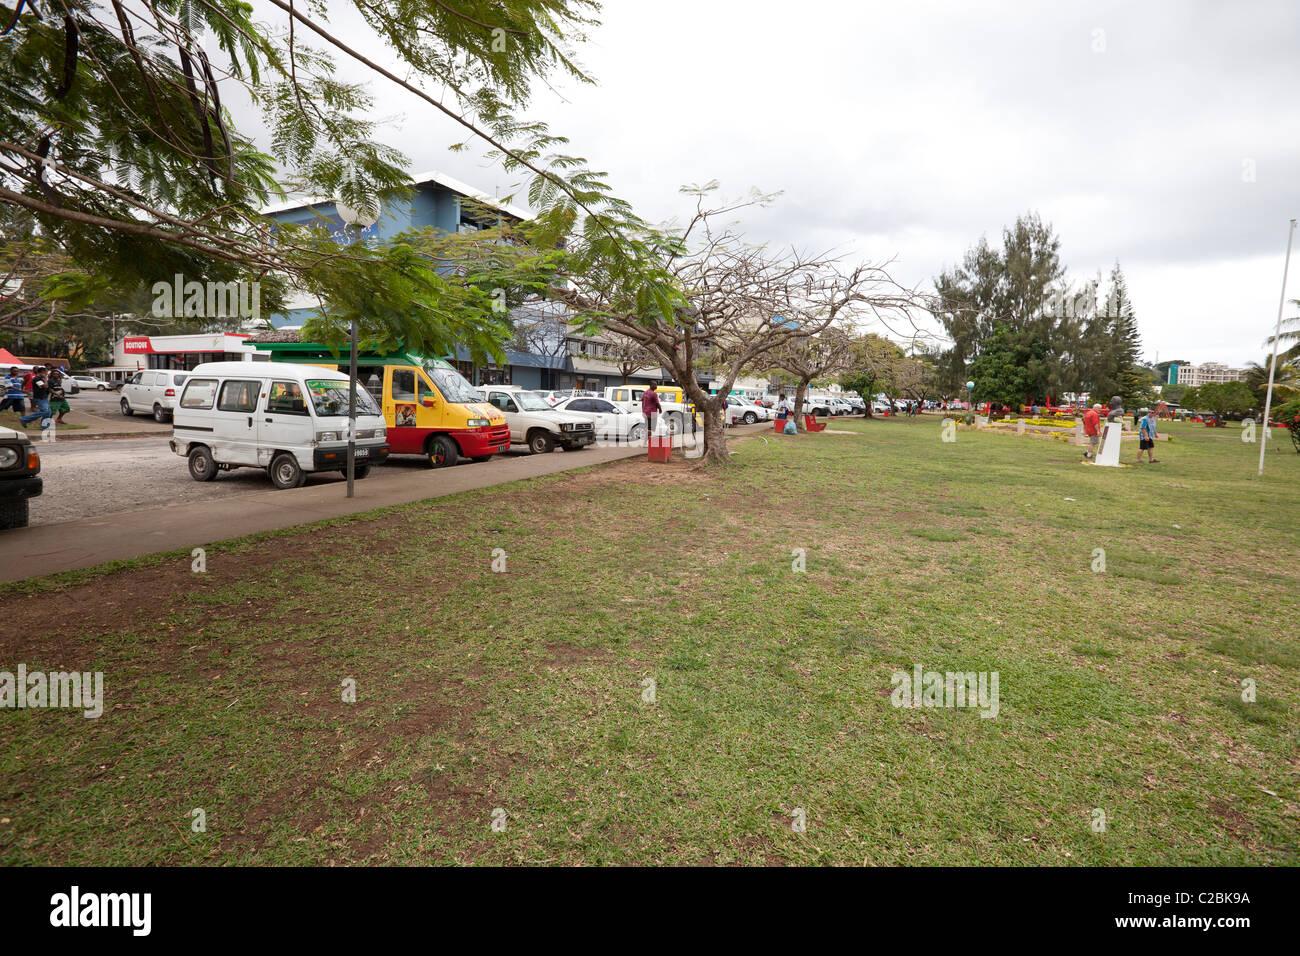 Port Vila, Vanuatu - South Pacific - Stock Image